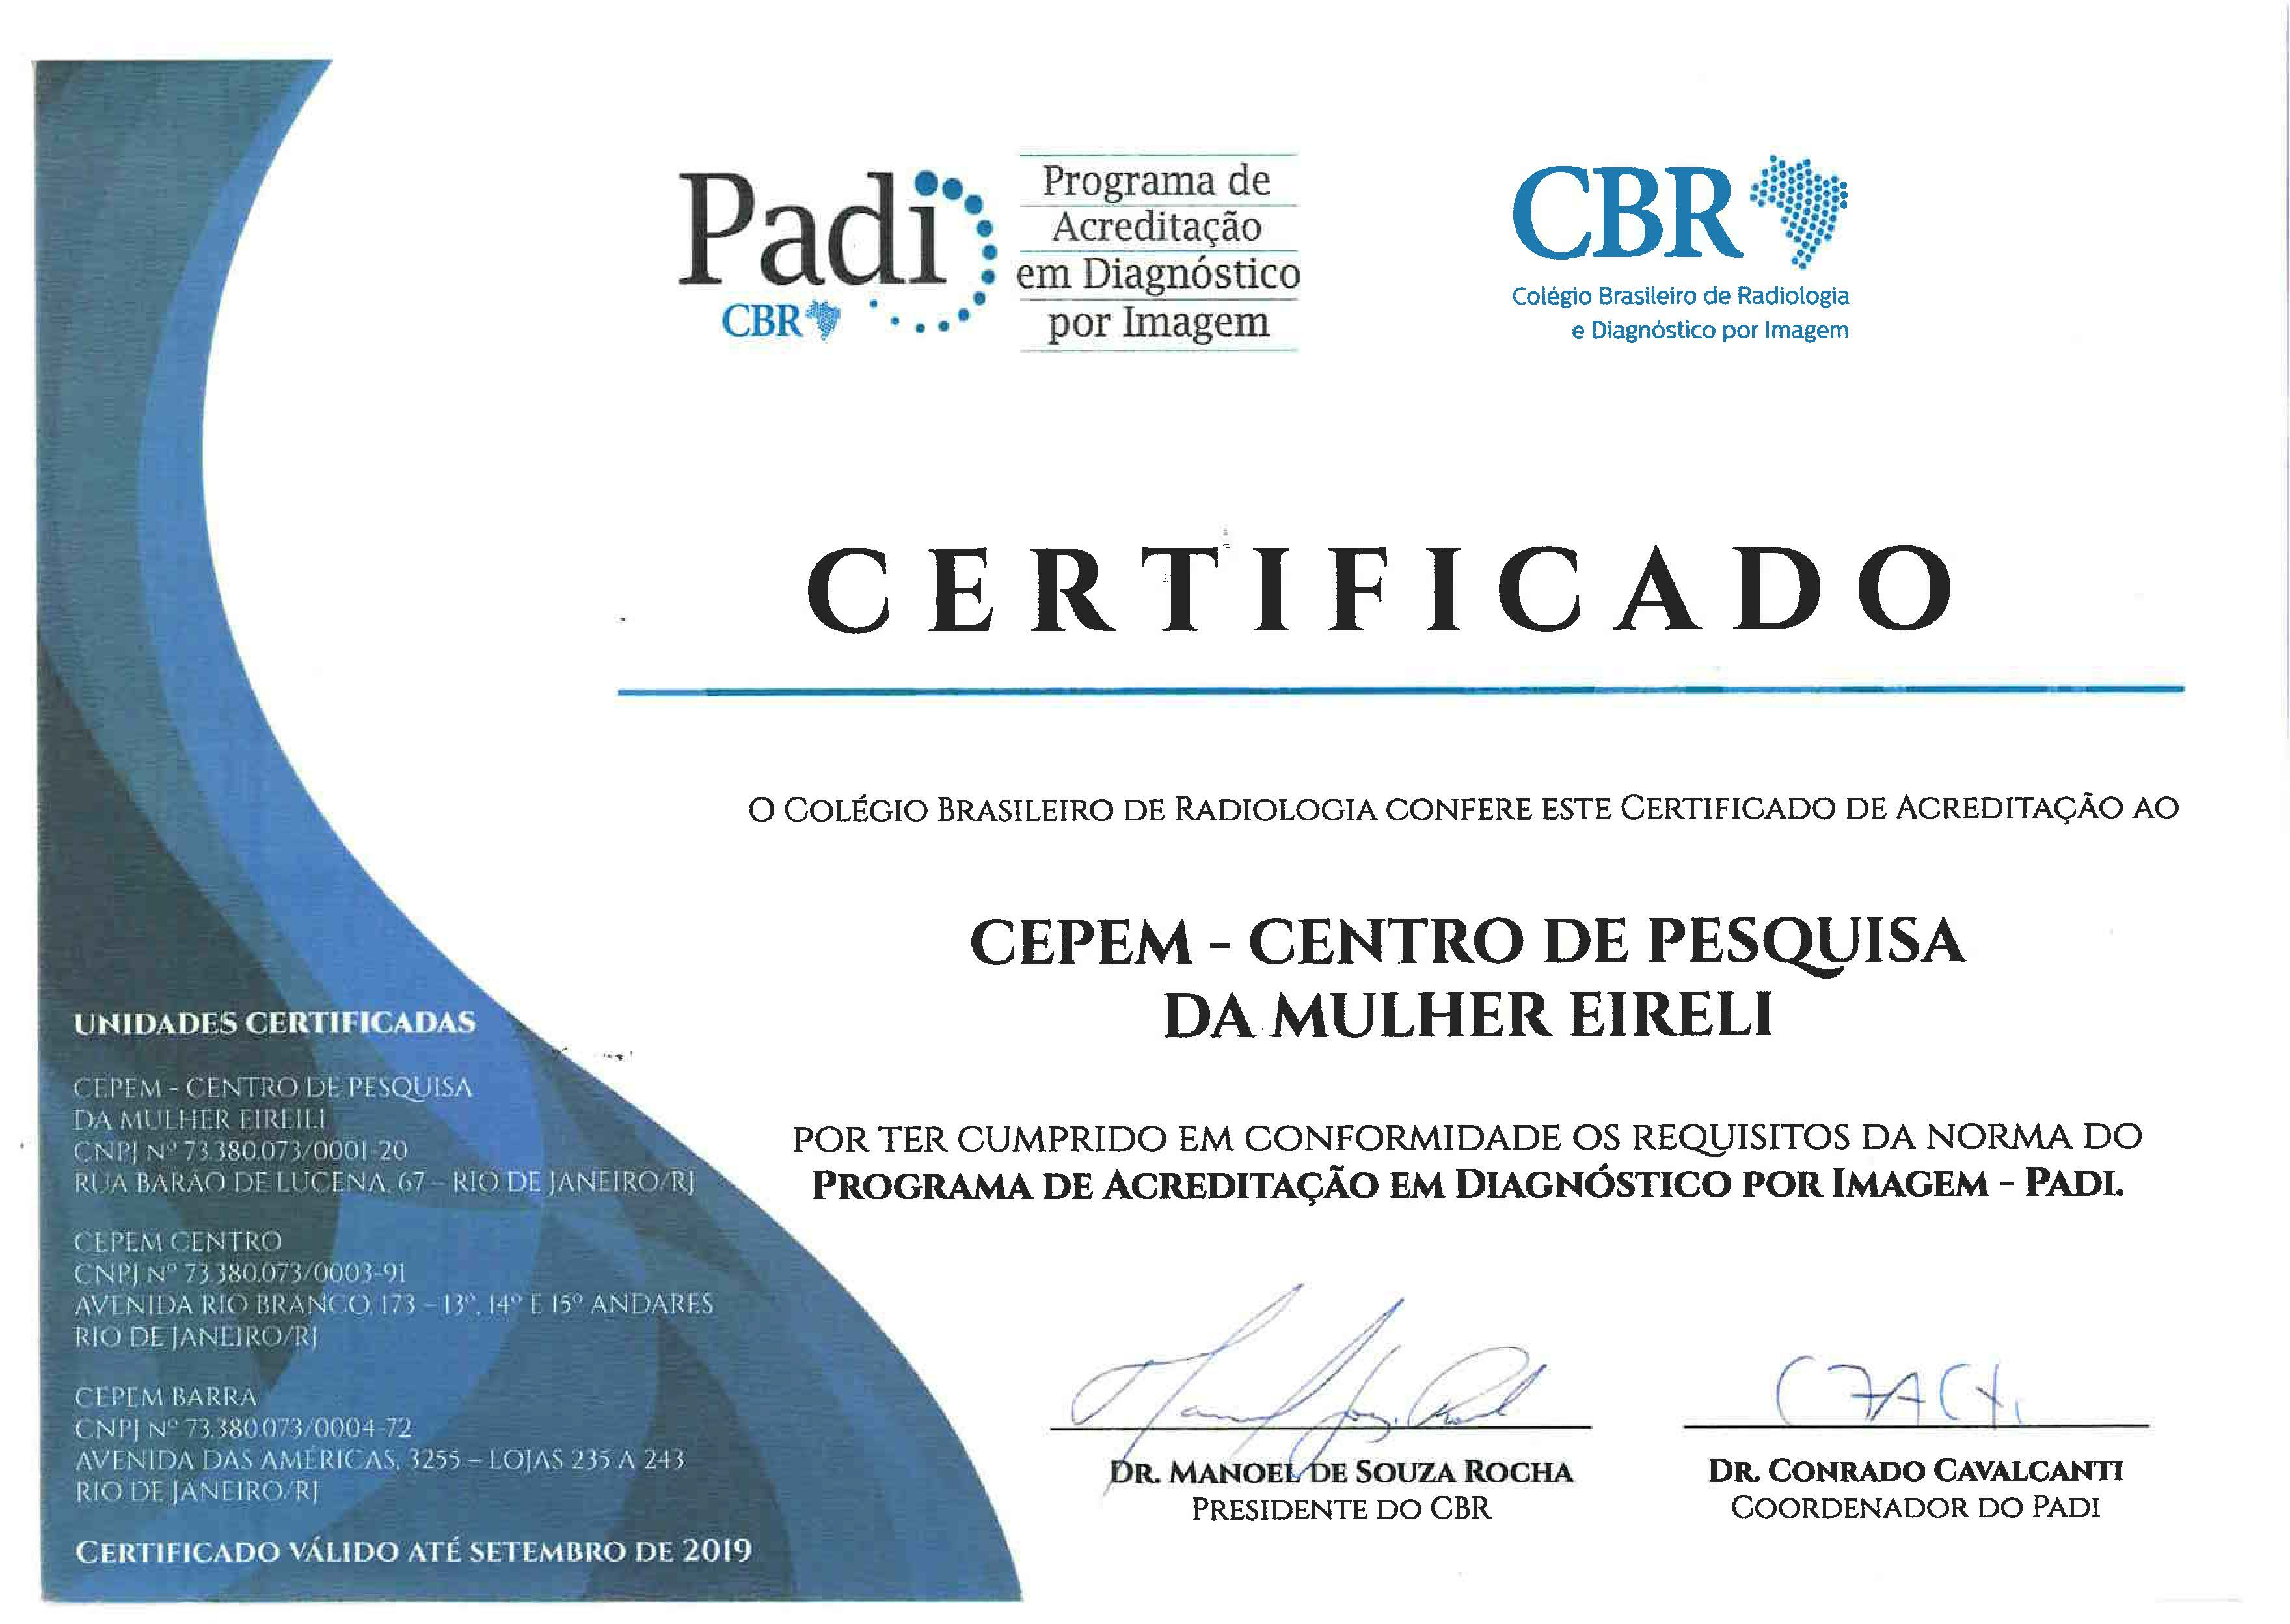 Certificado PADI 2018